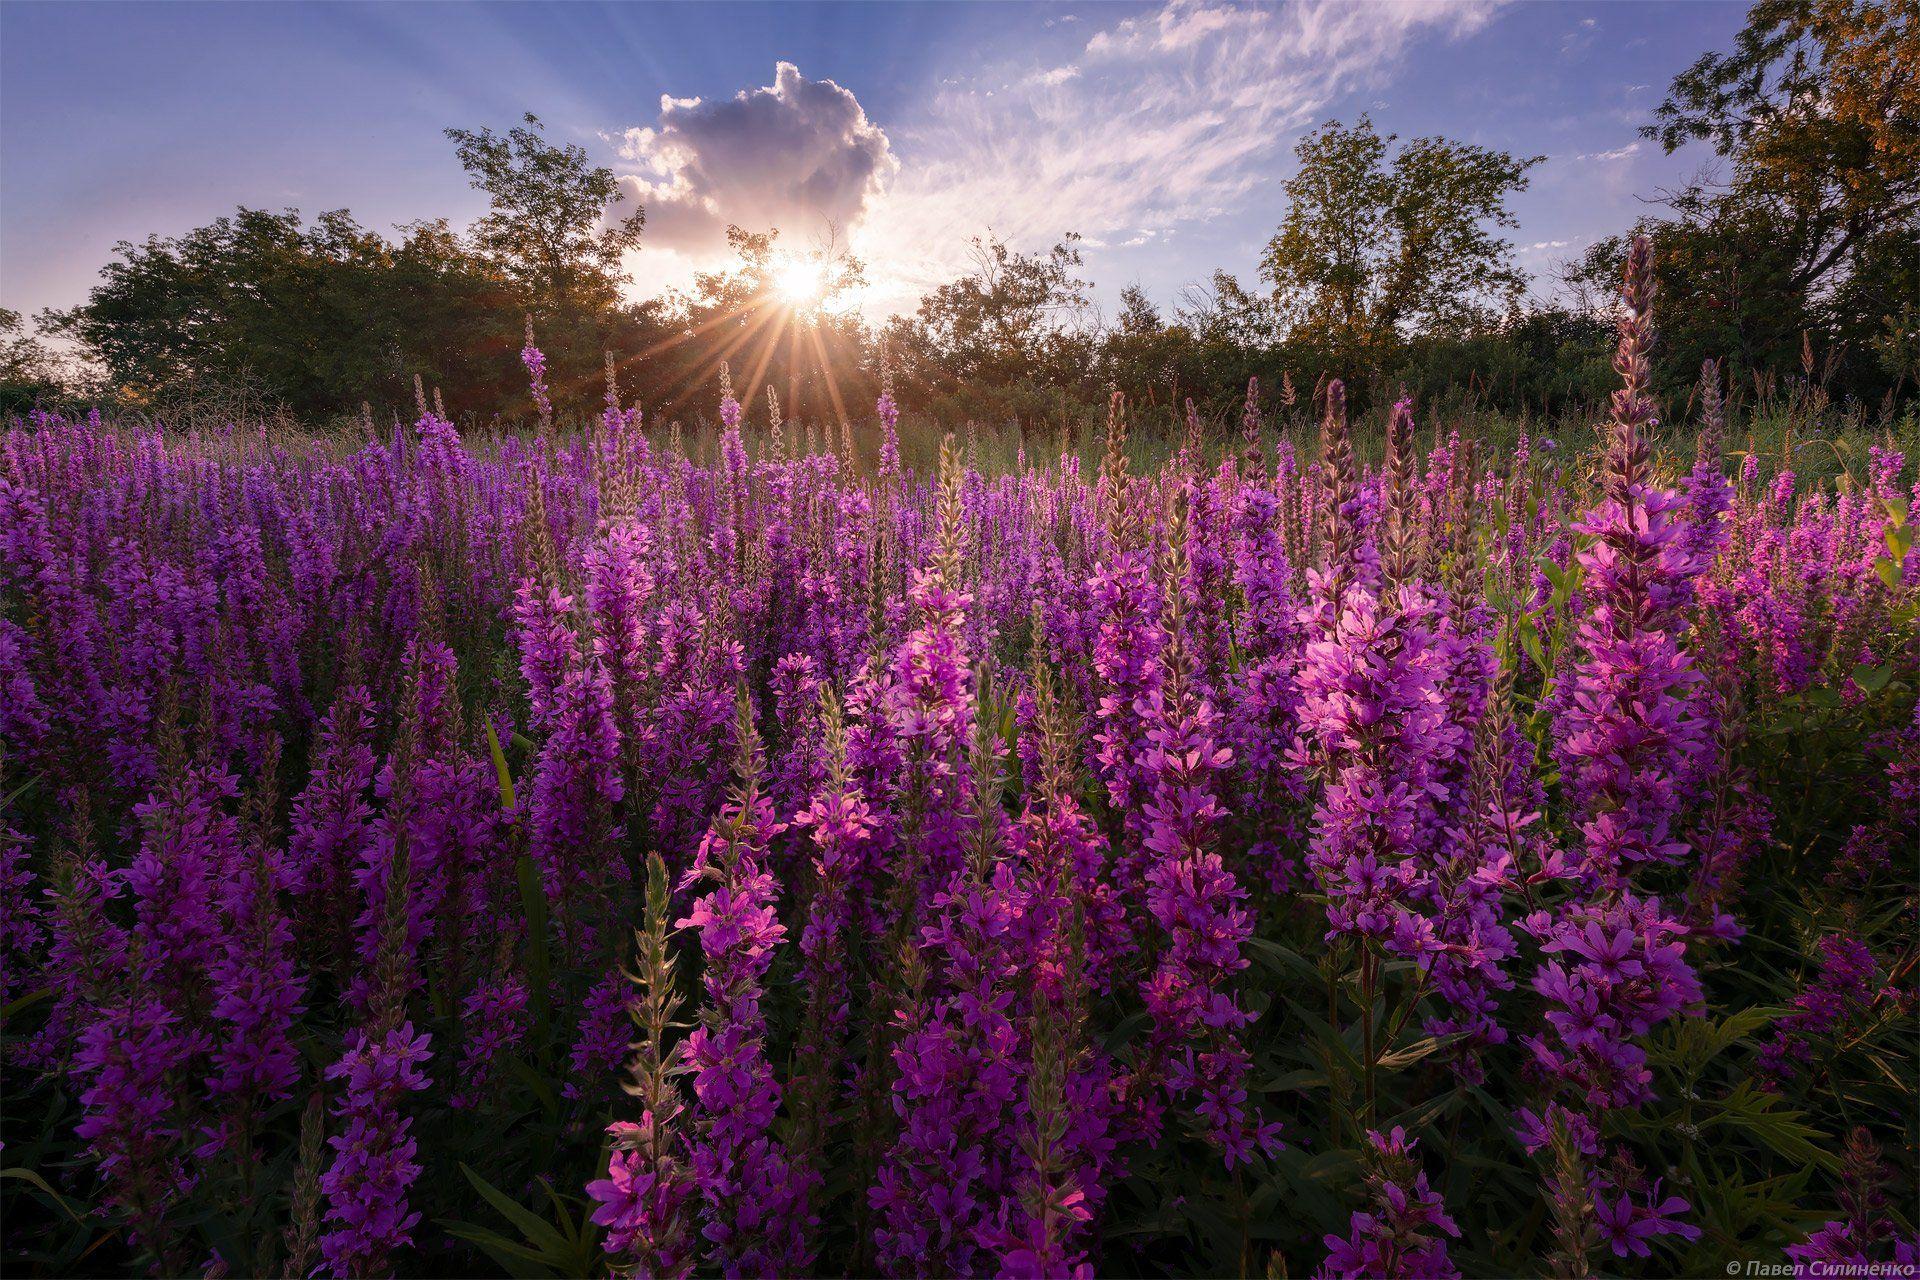 пейзаж, цветы, закат, солнце, цвет, лучи, луг, лето, Павел Силиненко